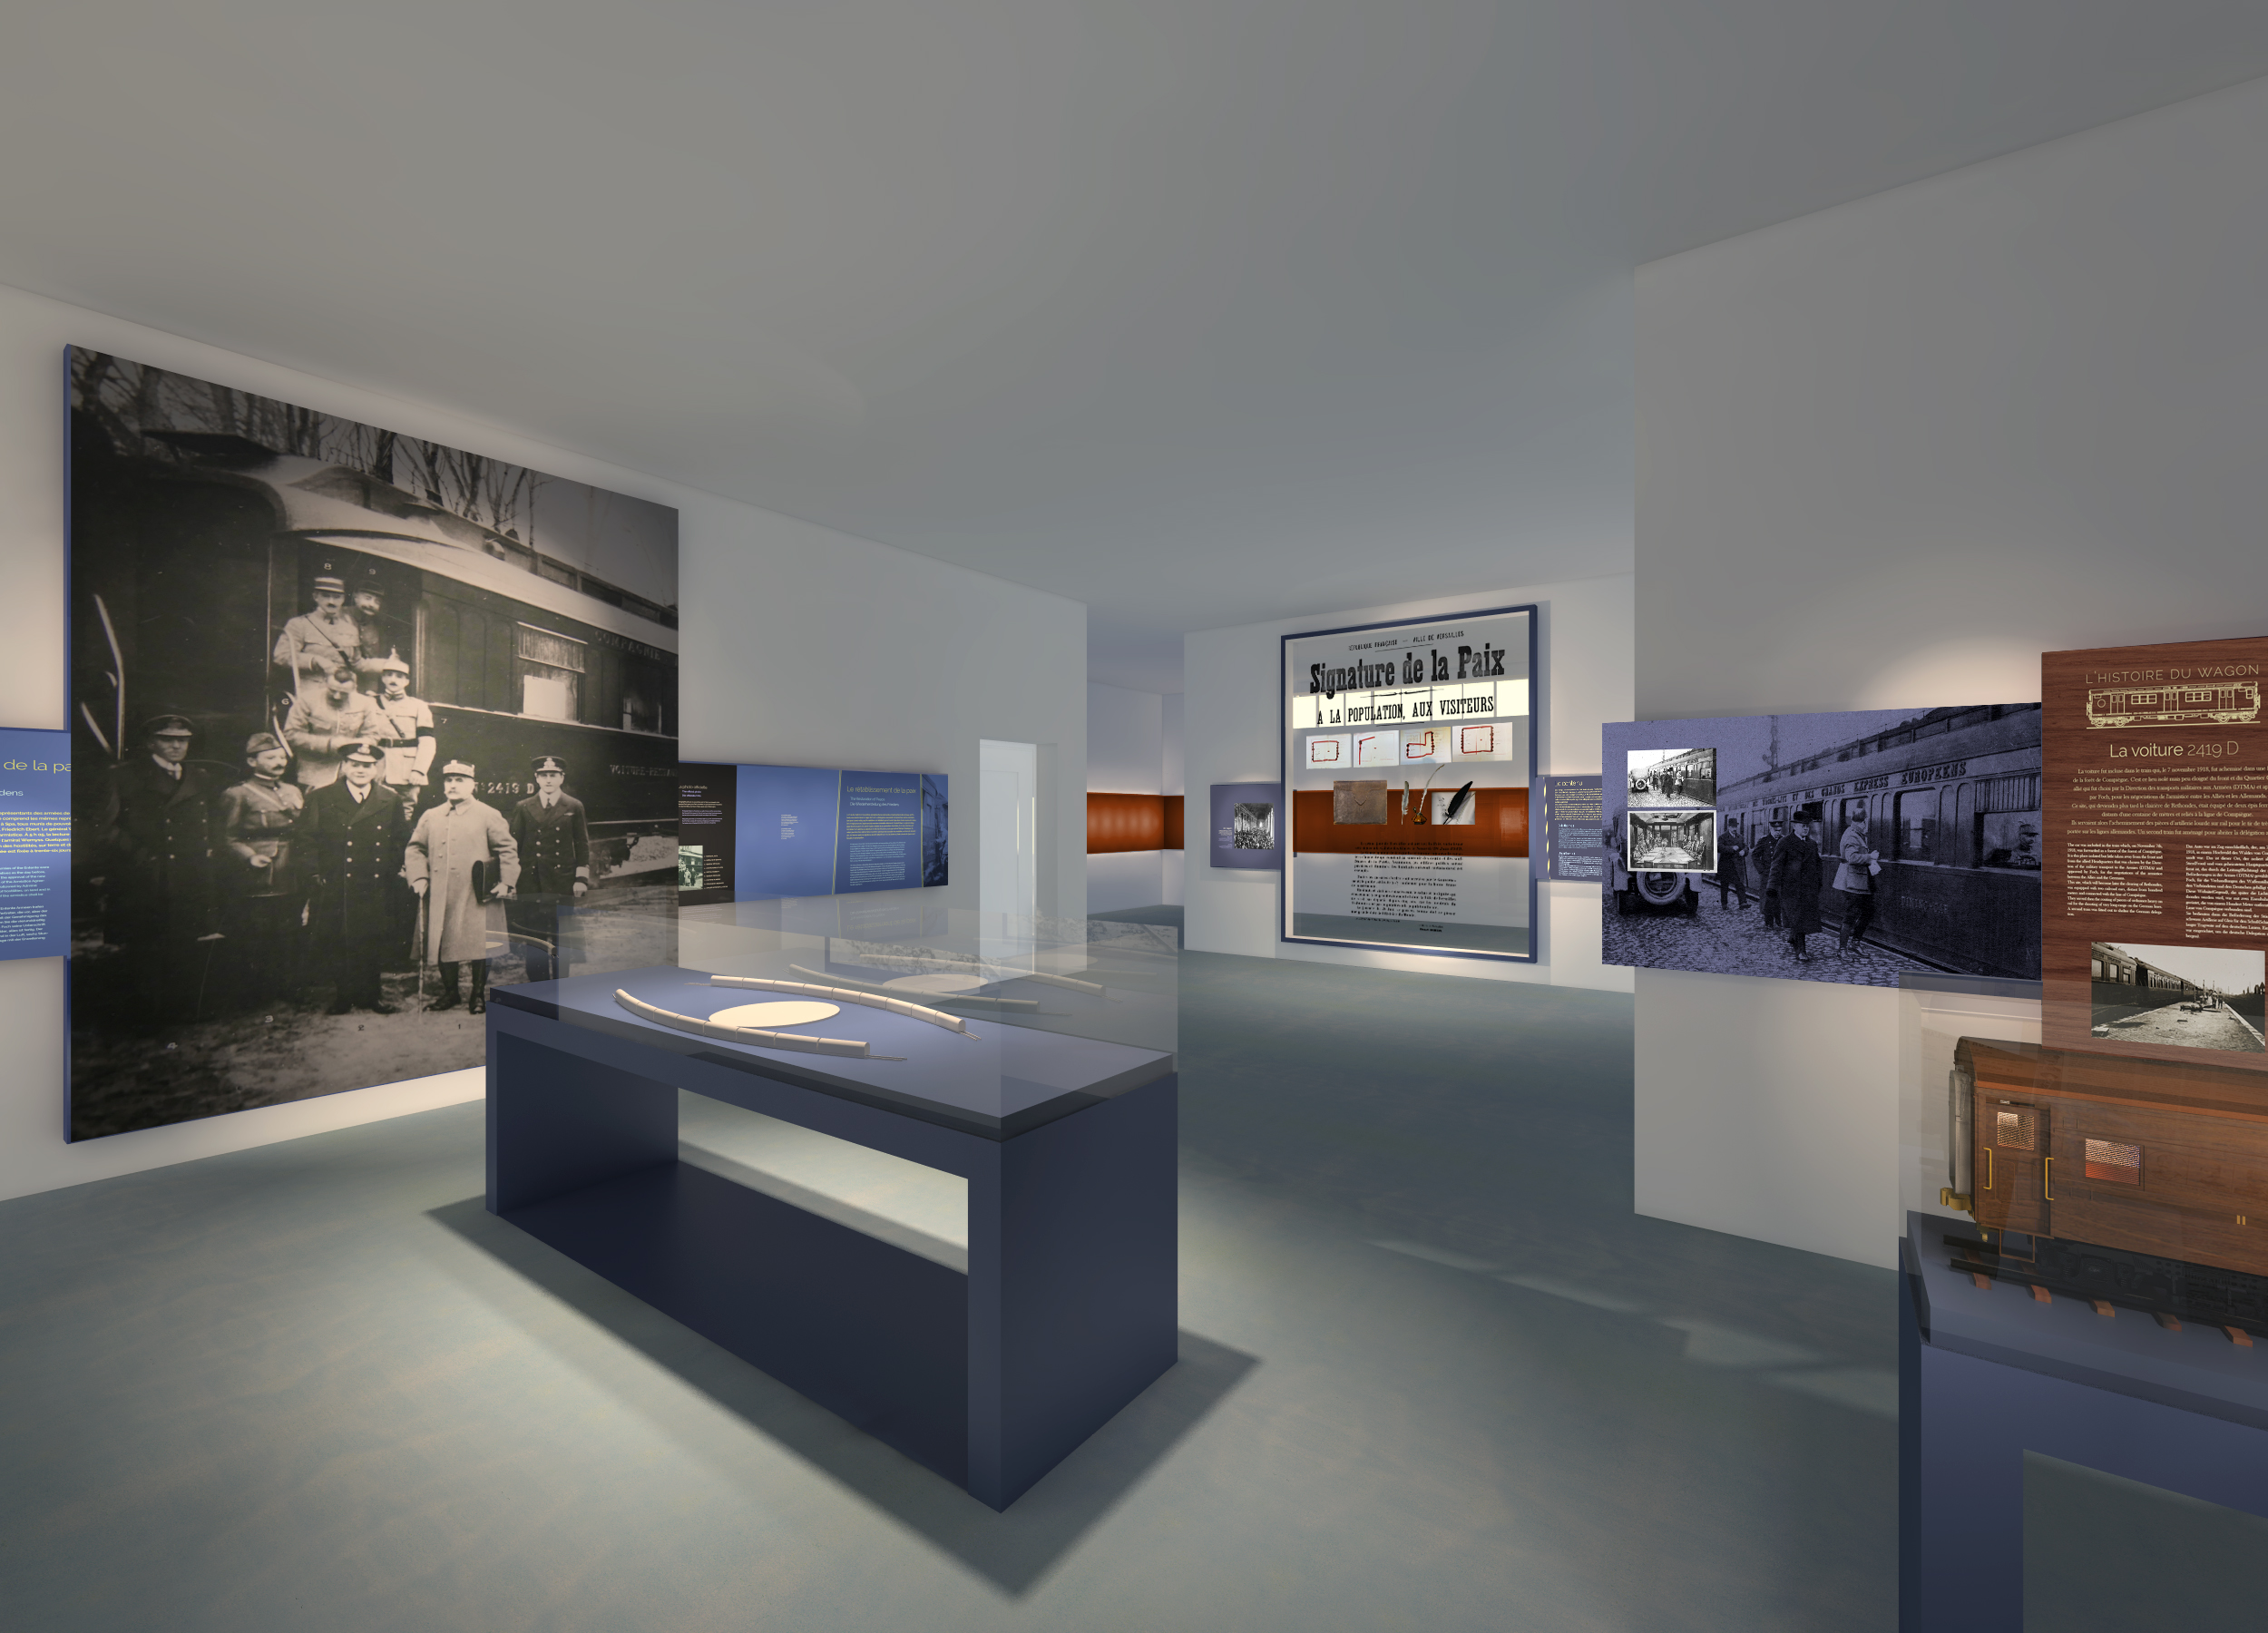 la-salle-armistice-1918-scénographie